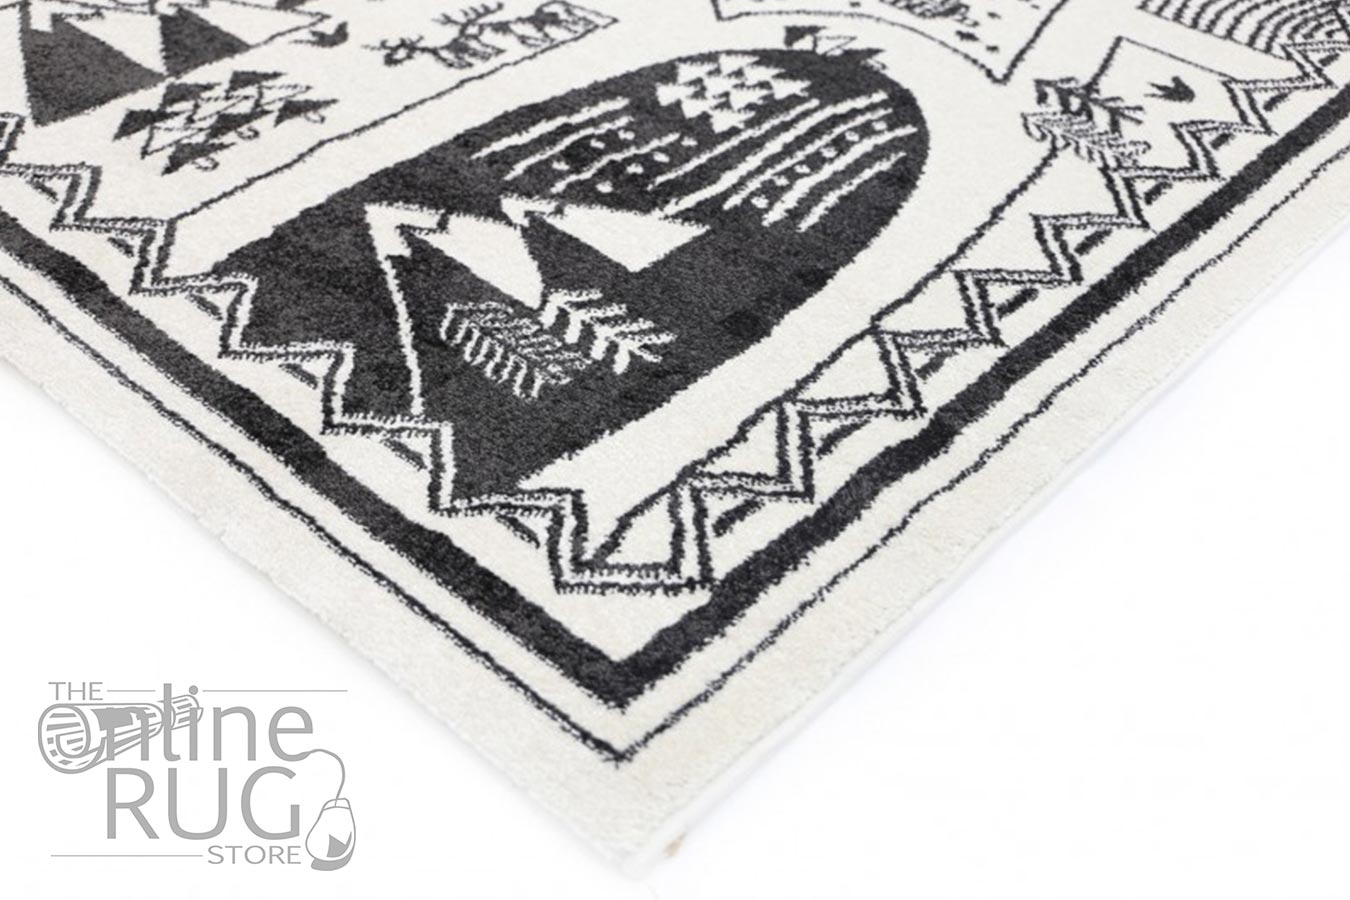 Bambino Black White Tribal Camp Pattern Rug